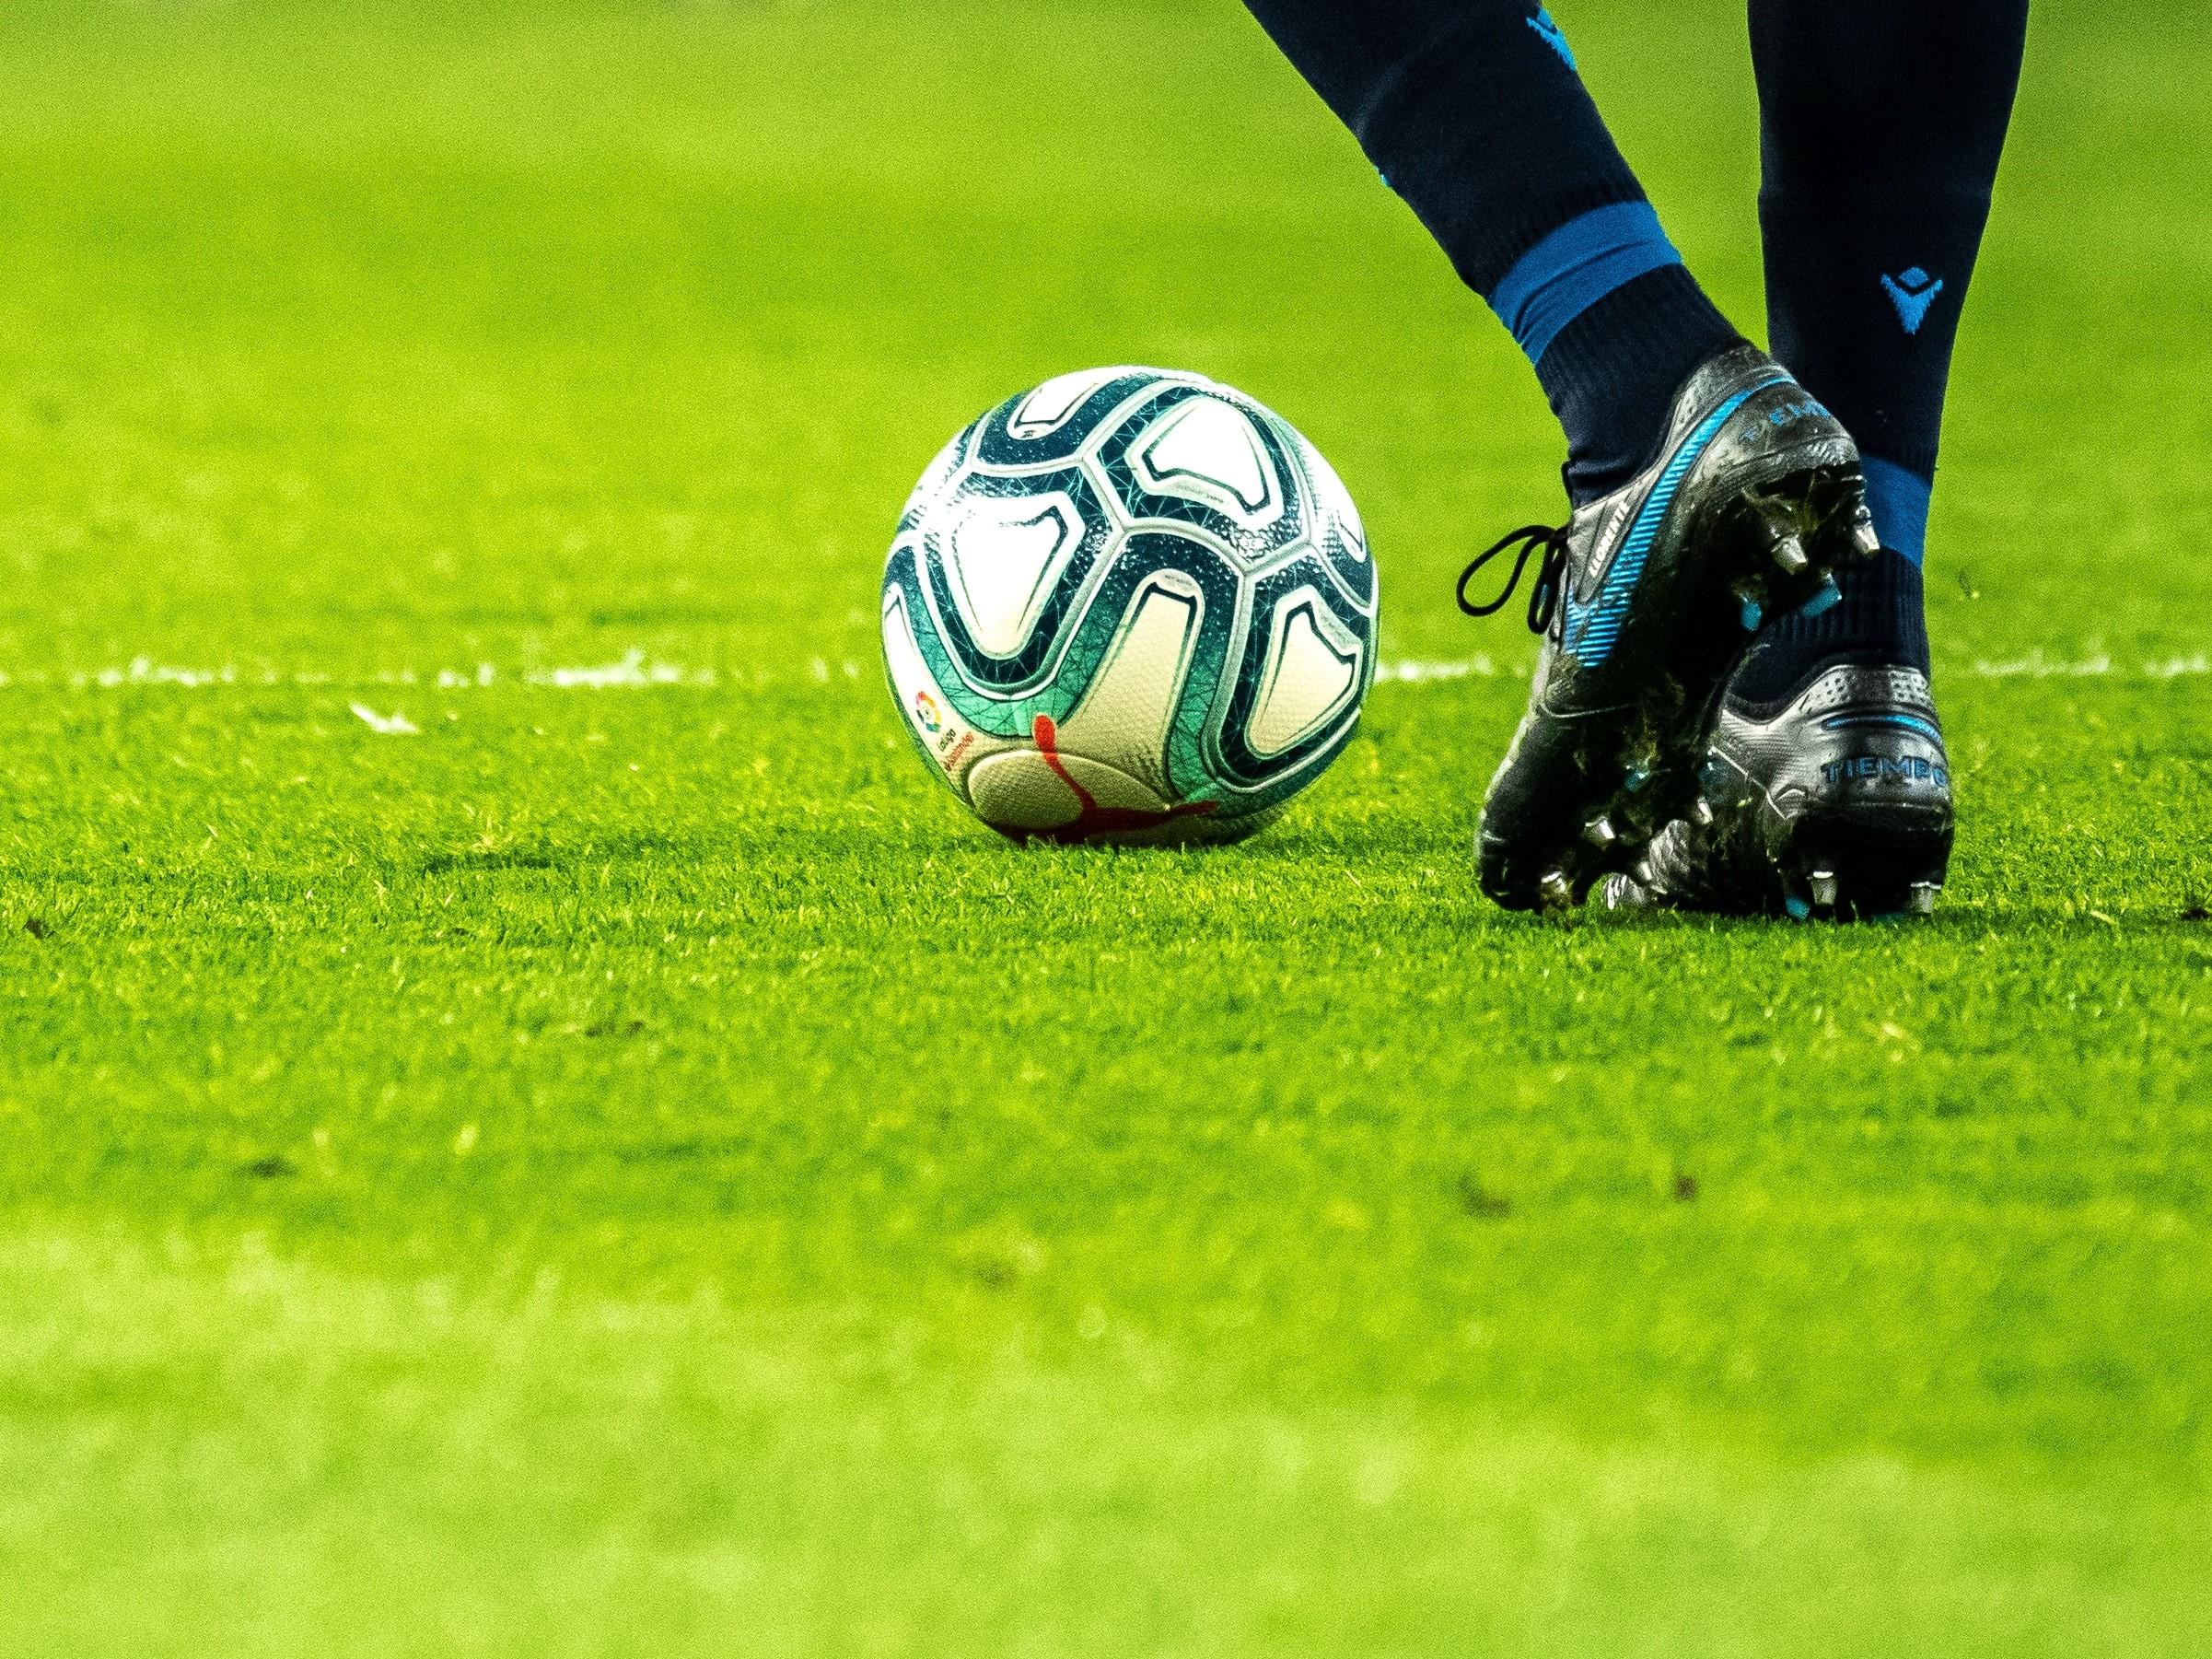 feet and soccer ball